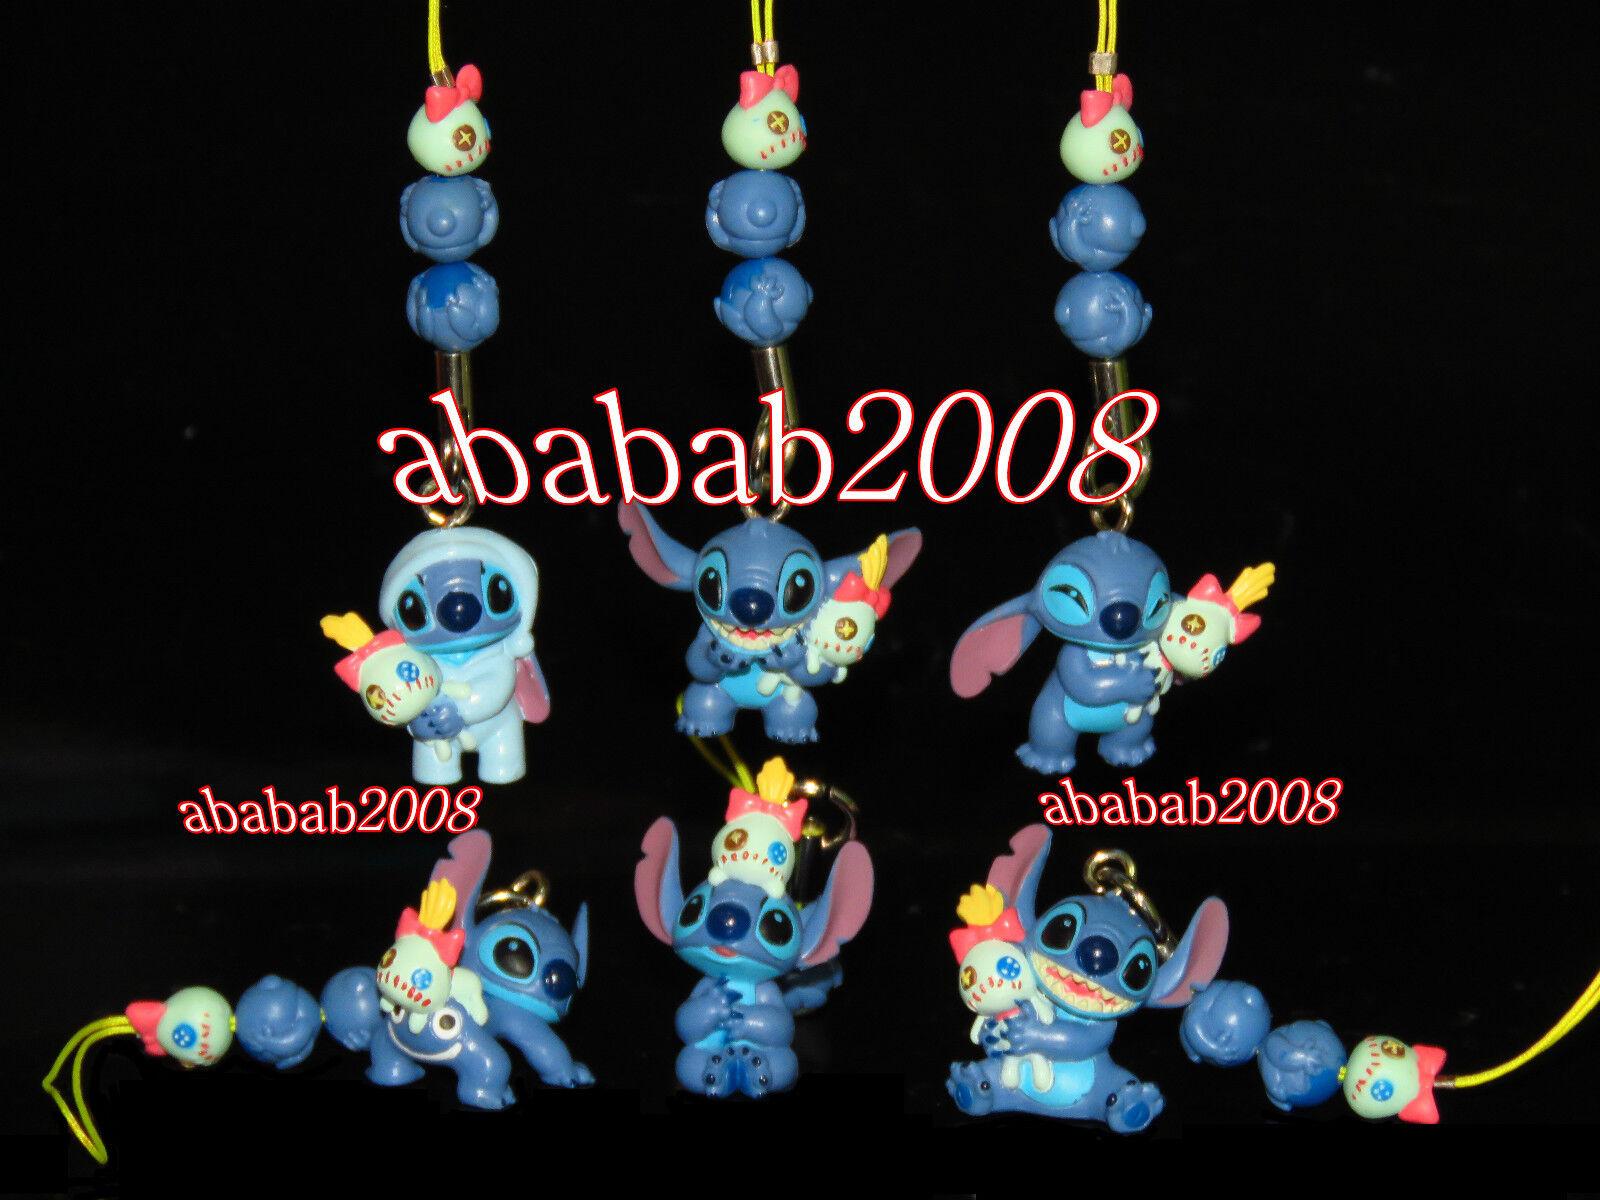 Yujin Lilo Stitch strap figure playing together gashapon (full set of 6 figures)